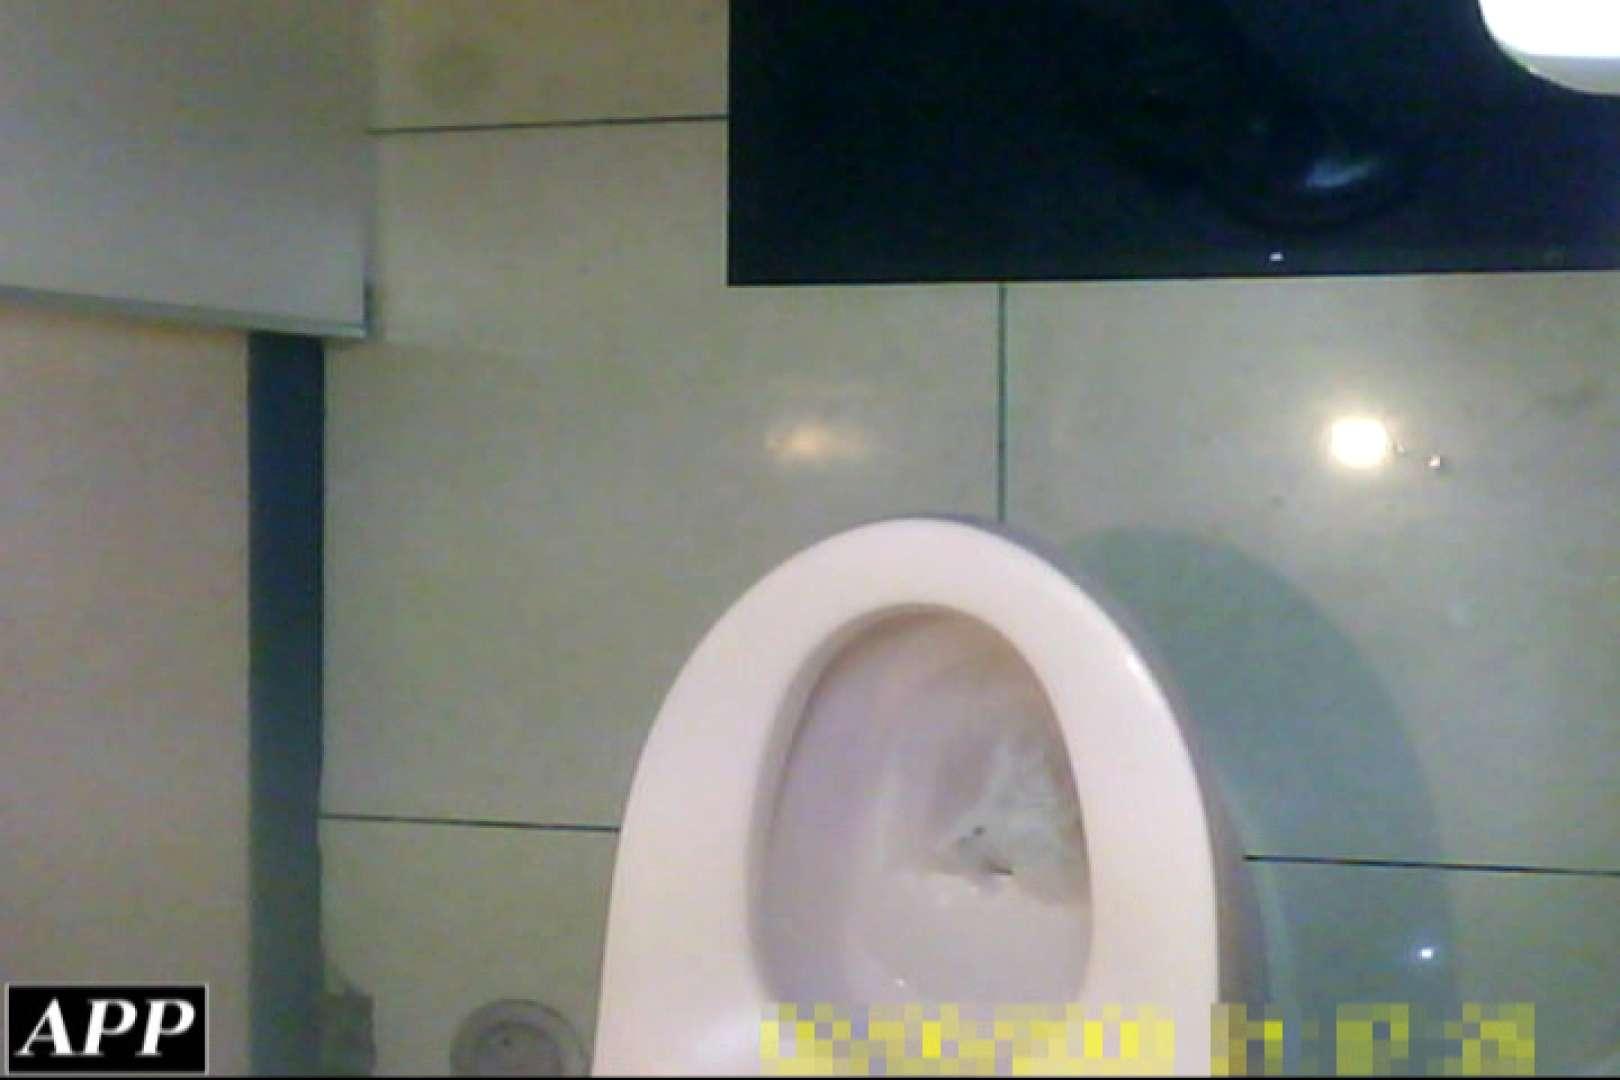 3視点洗面所 vol.71 盗撮 | 無修正オマンコ  69画像 13